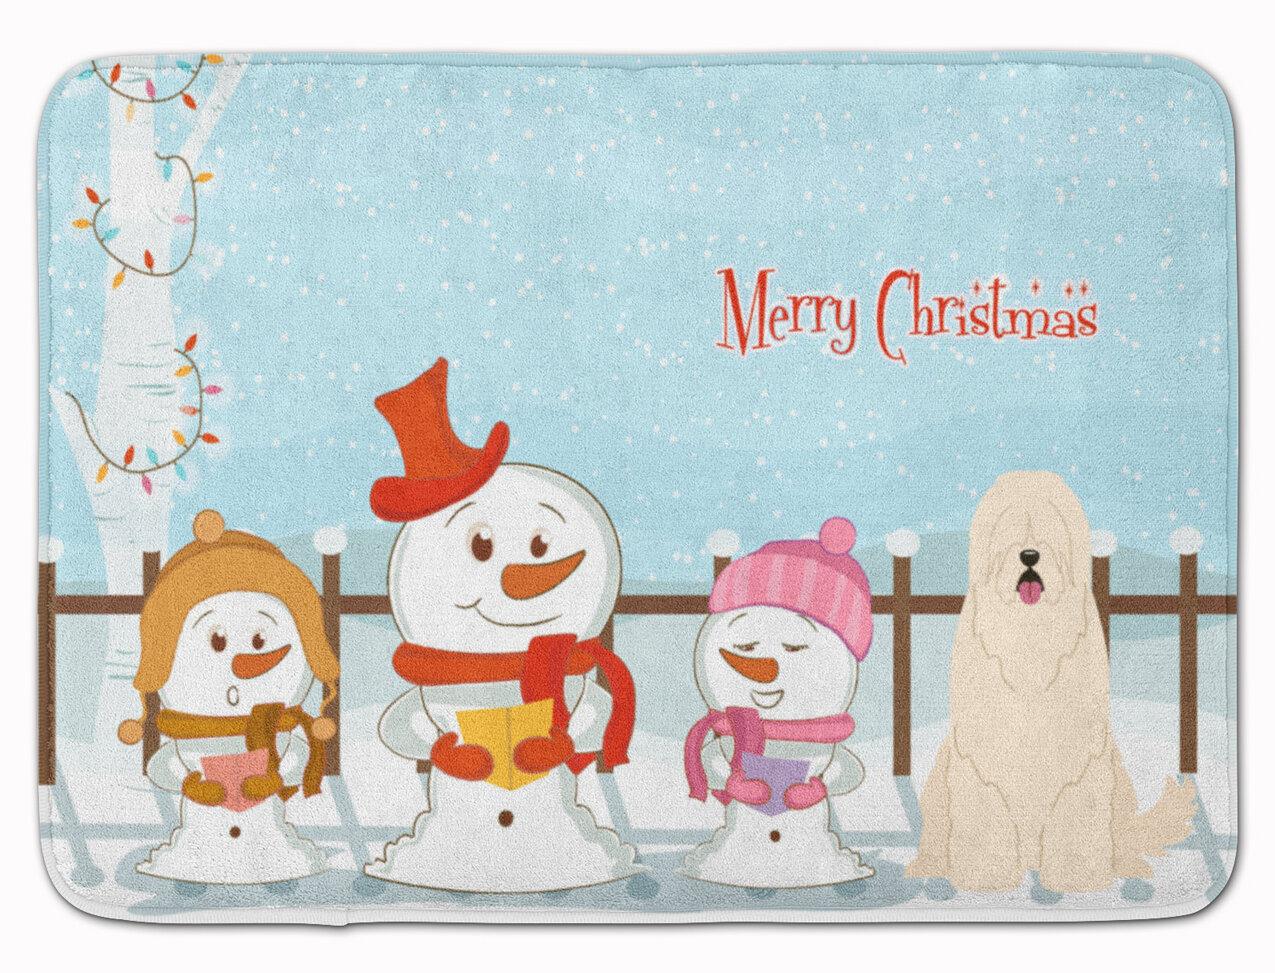 Merry Christmas In Russian.Merry Christmas South Russian Sheepdog Memory Foam Bath Rug